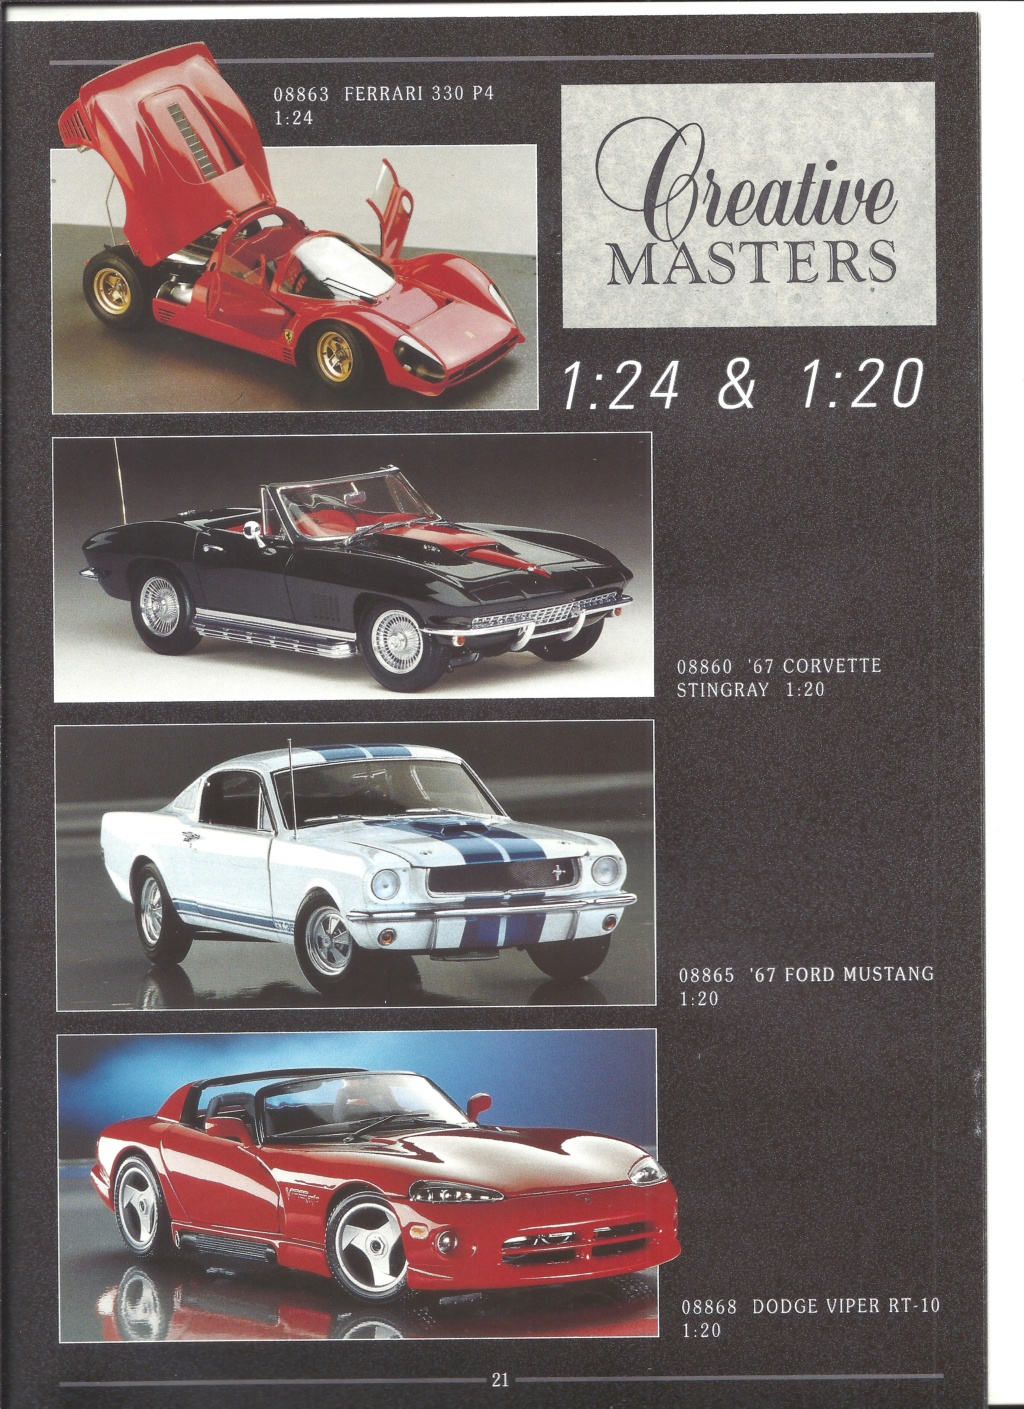 [REVELL 1995] Catalogue METAL miniatures 1995  Revell51